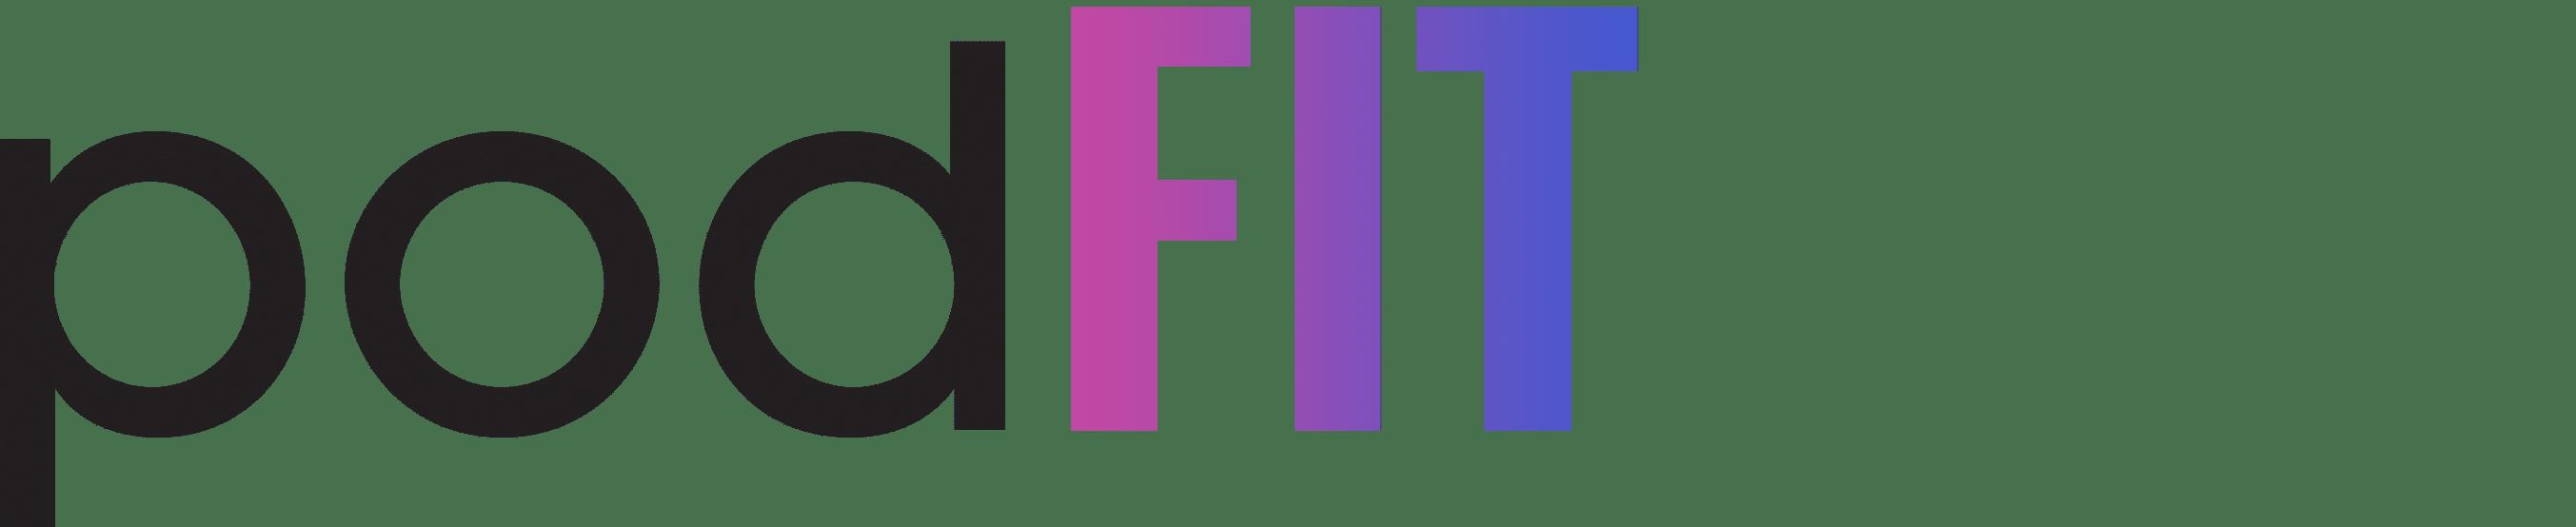 pod-logos-fit